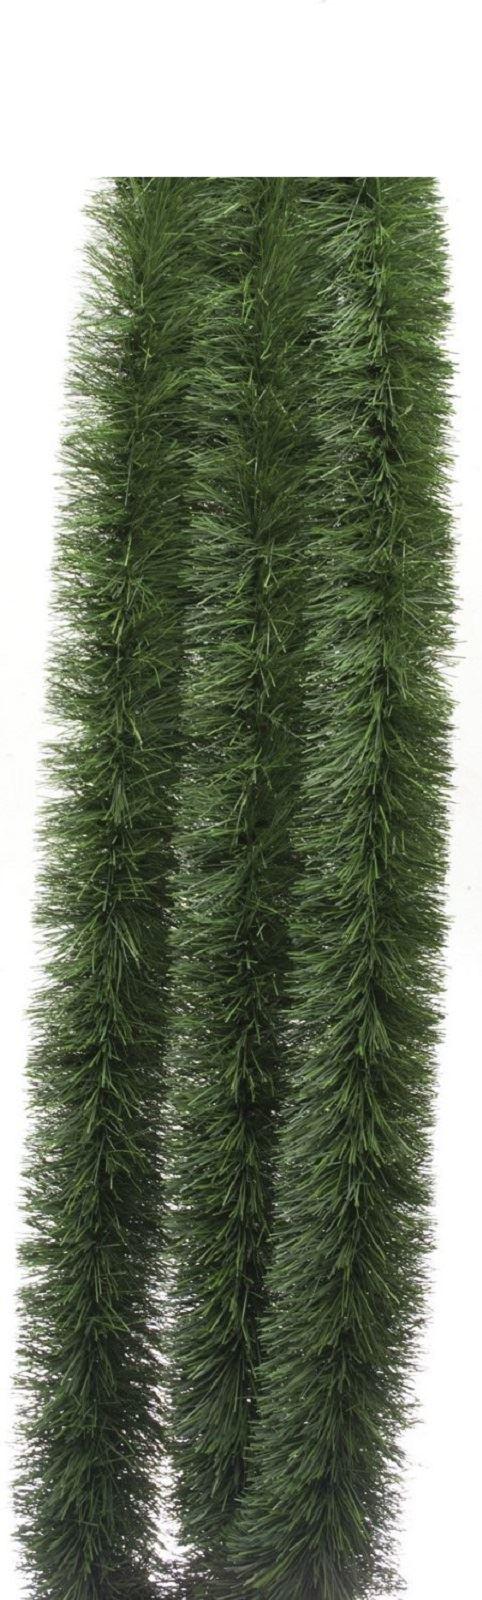 M luxury chunky xmas tinsel garland tree room home